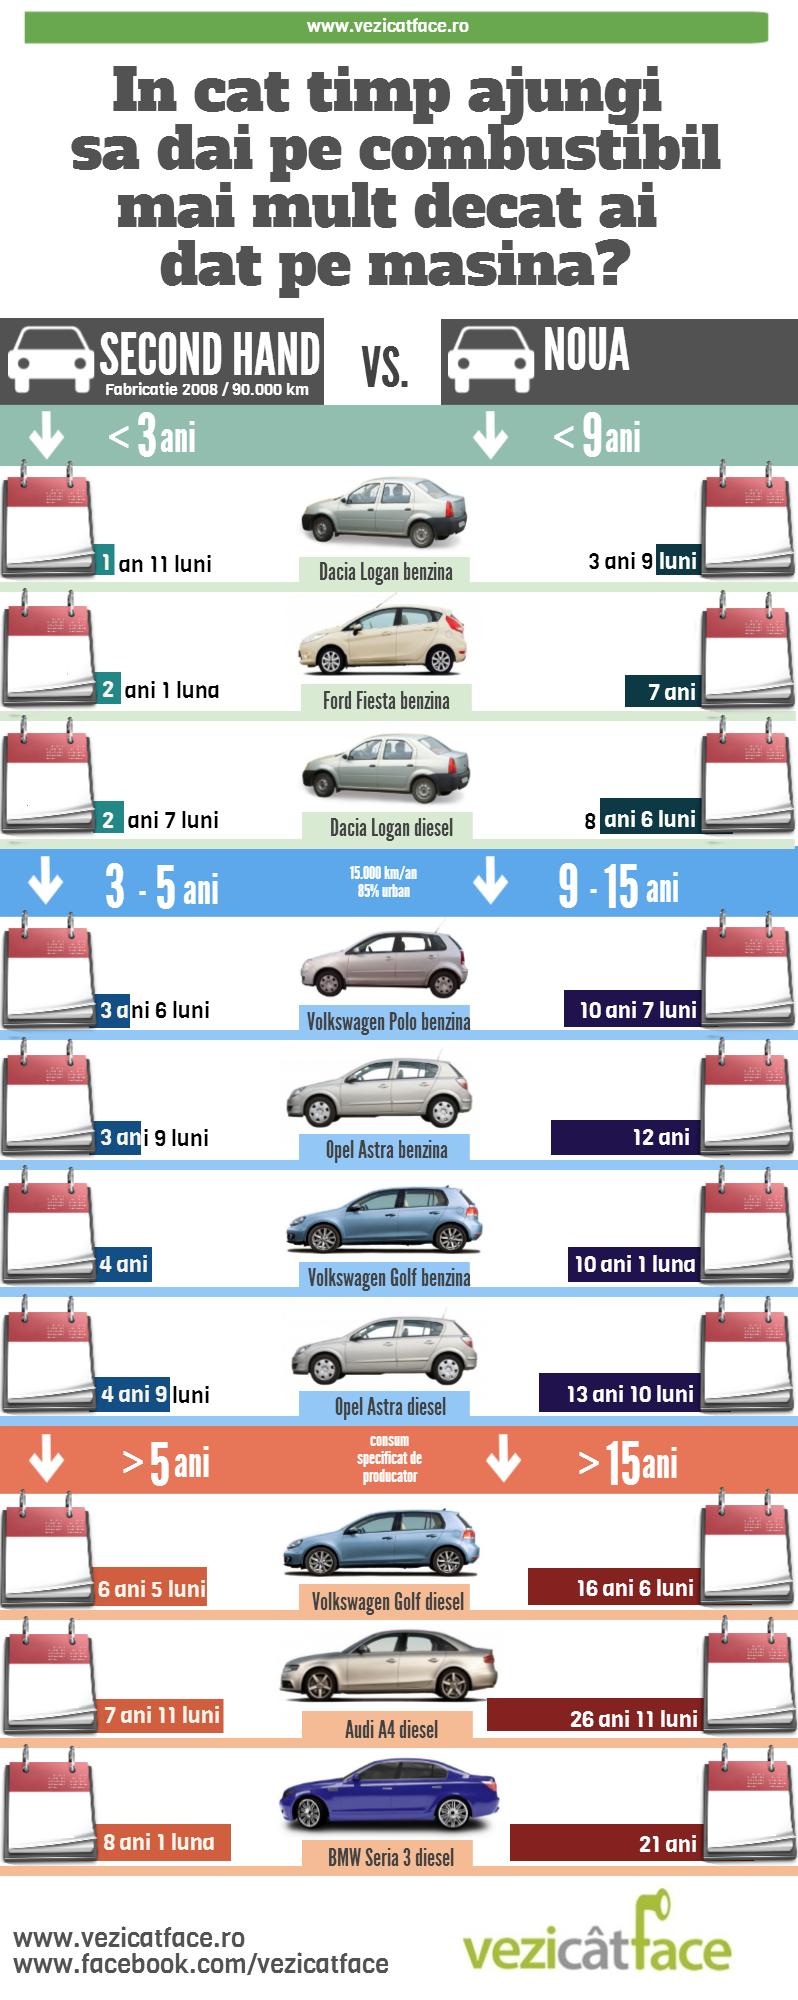 Infografic In cat timp ajungi sa dai pe combustibil mai mult decat ai dat pe masina?